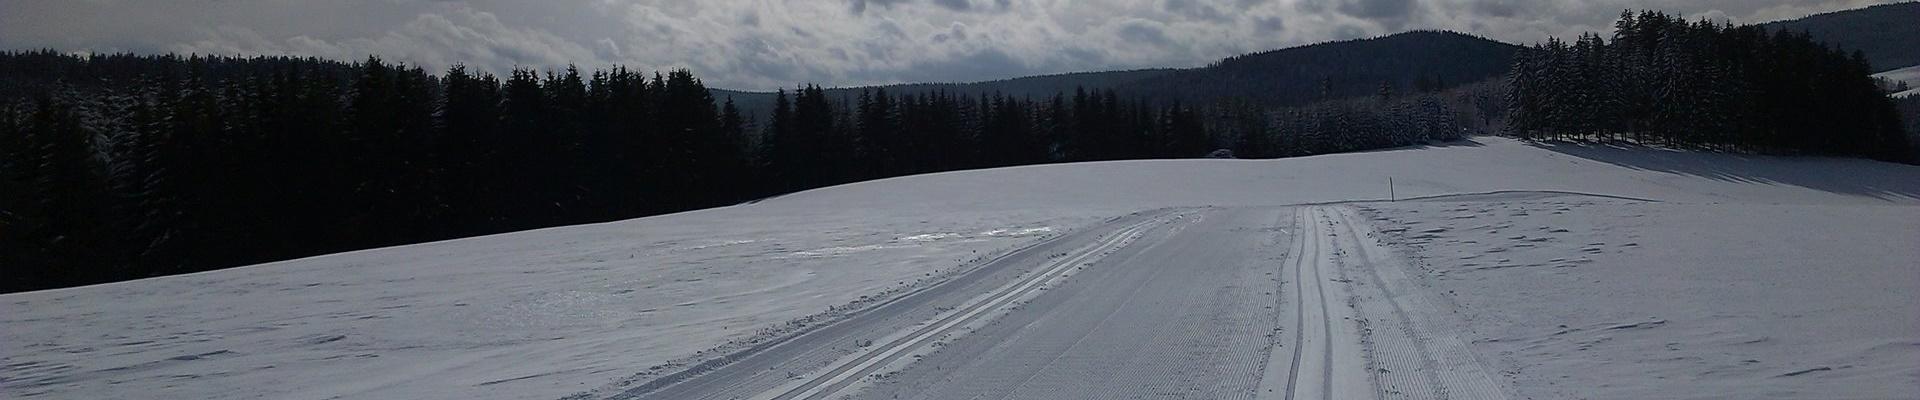 Thurnerloipe / Griesbachhof-Schwarzwald